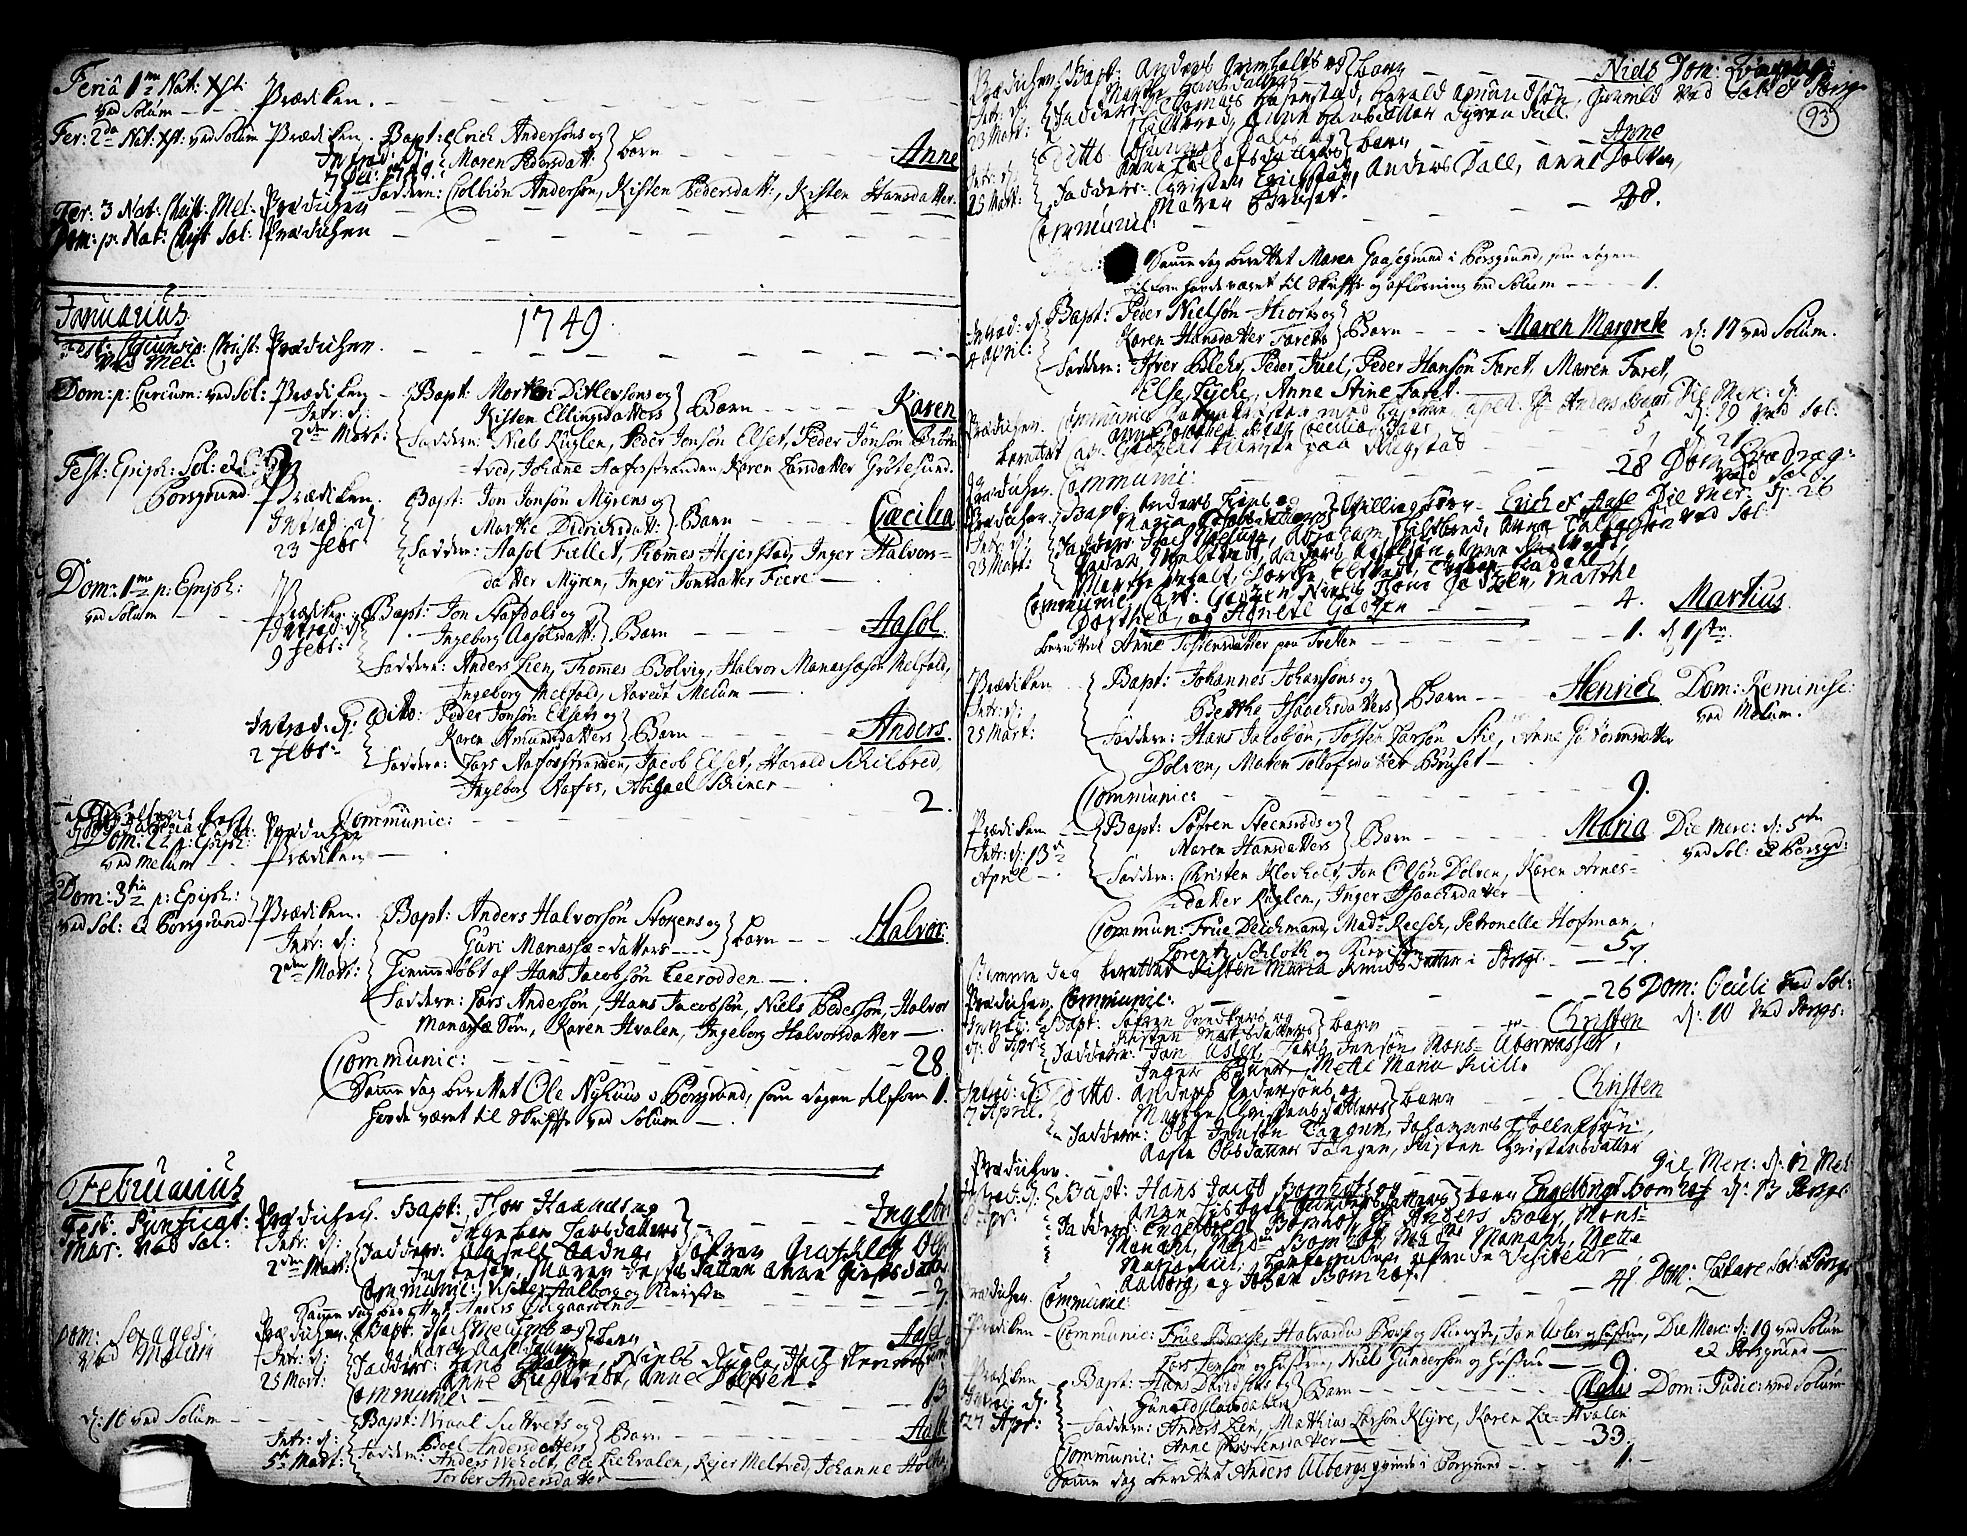 SAKO, Solum kirkebøker, F/Fa/L0002: Ministerialbok nr. I 2, 1713-1761, s. 93